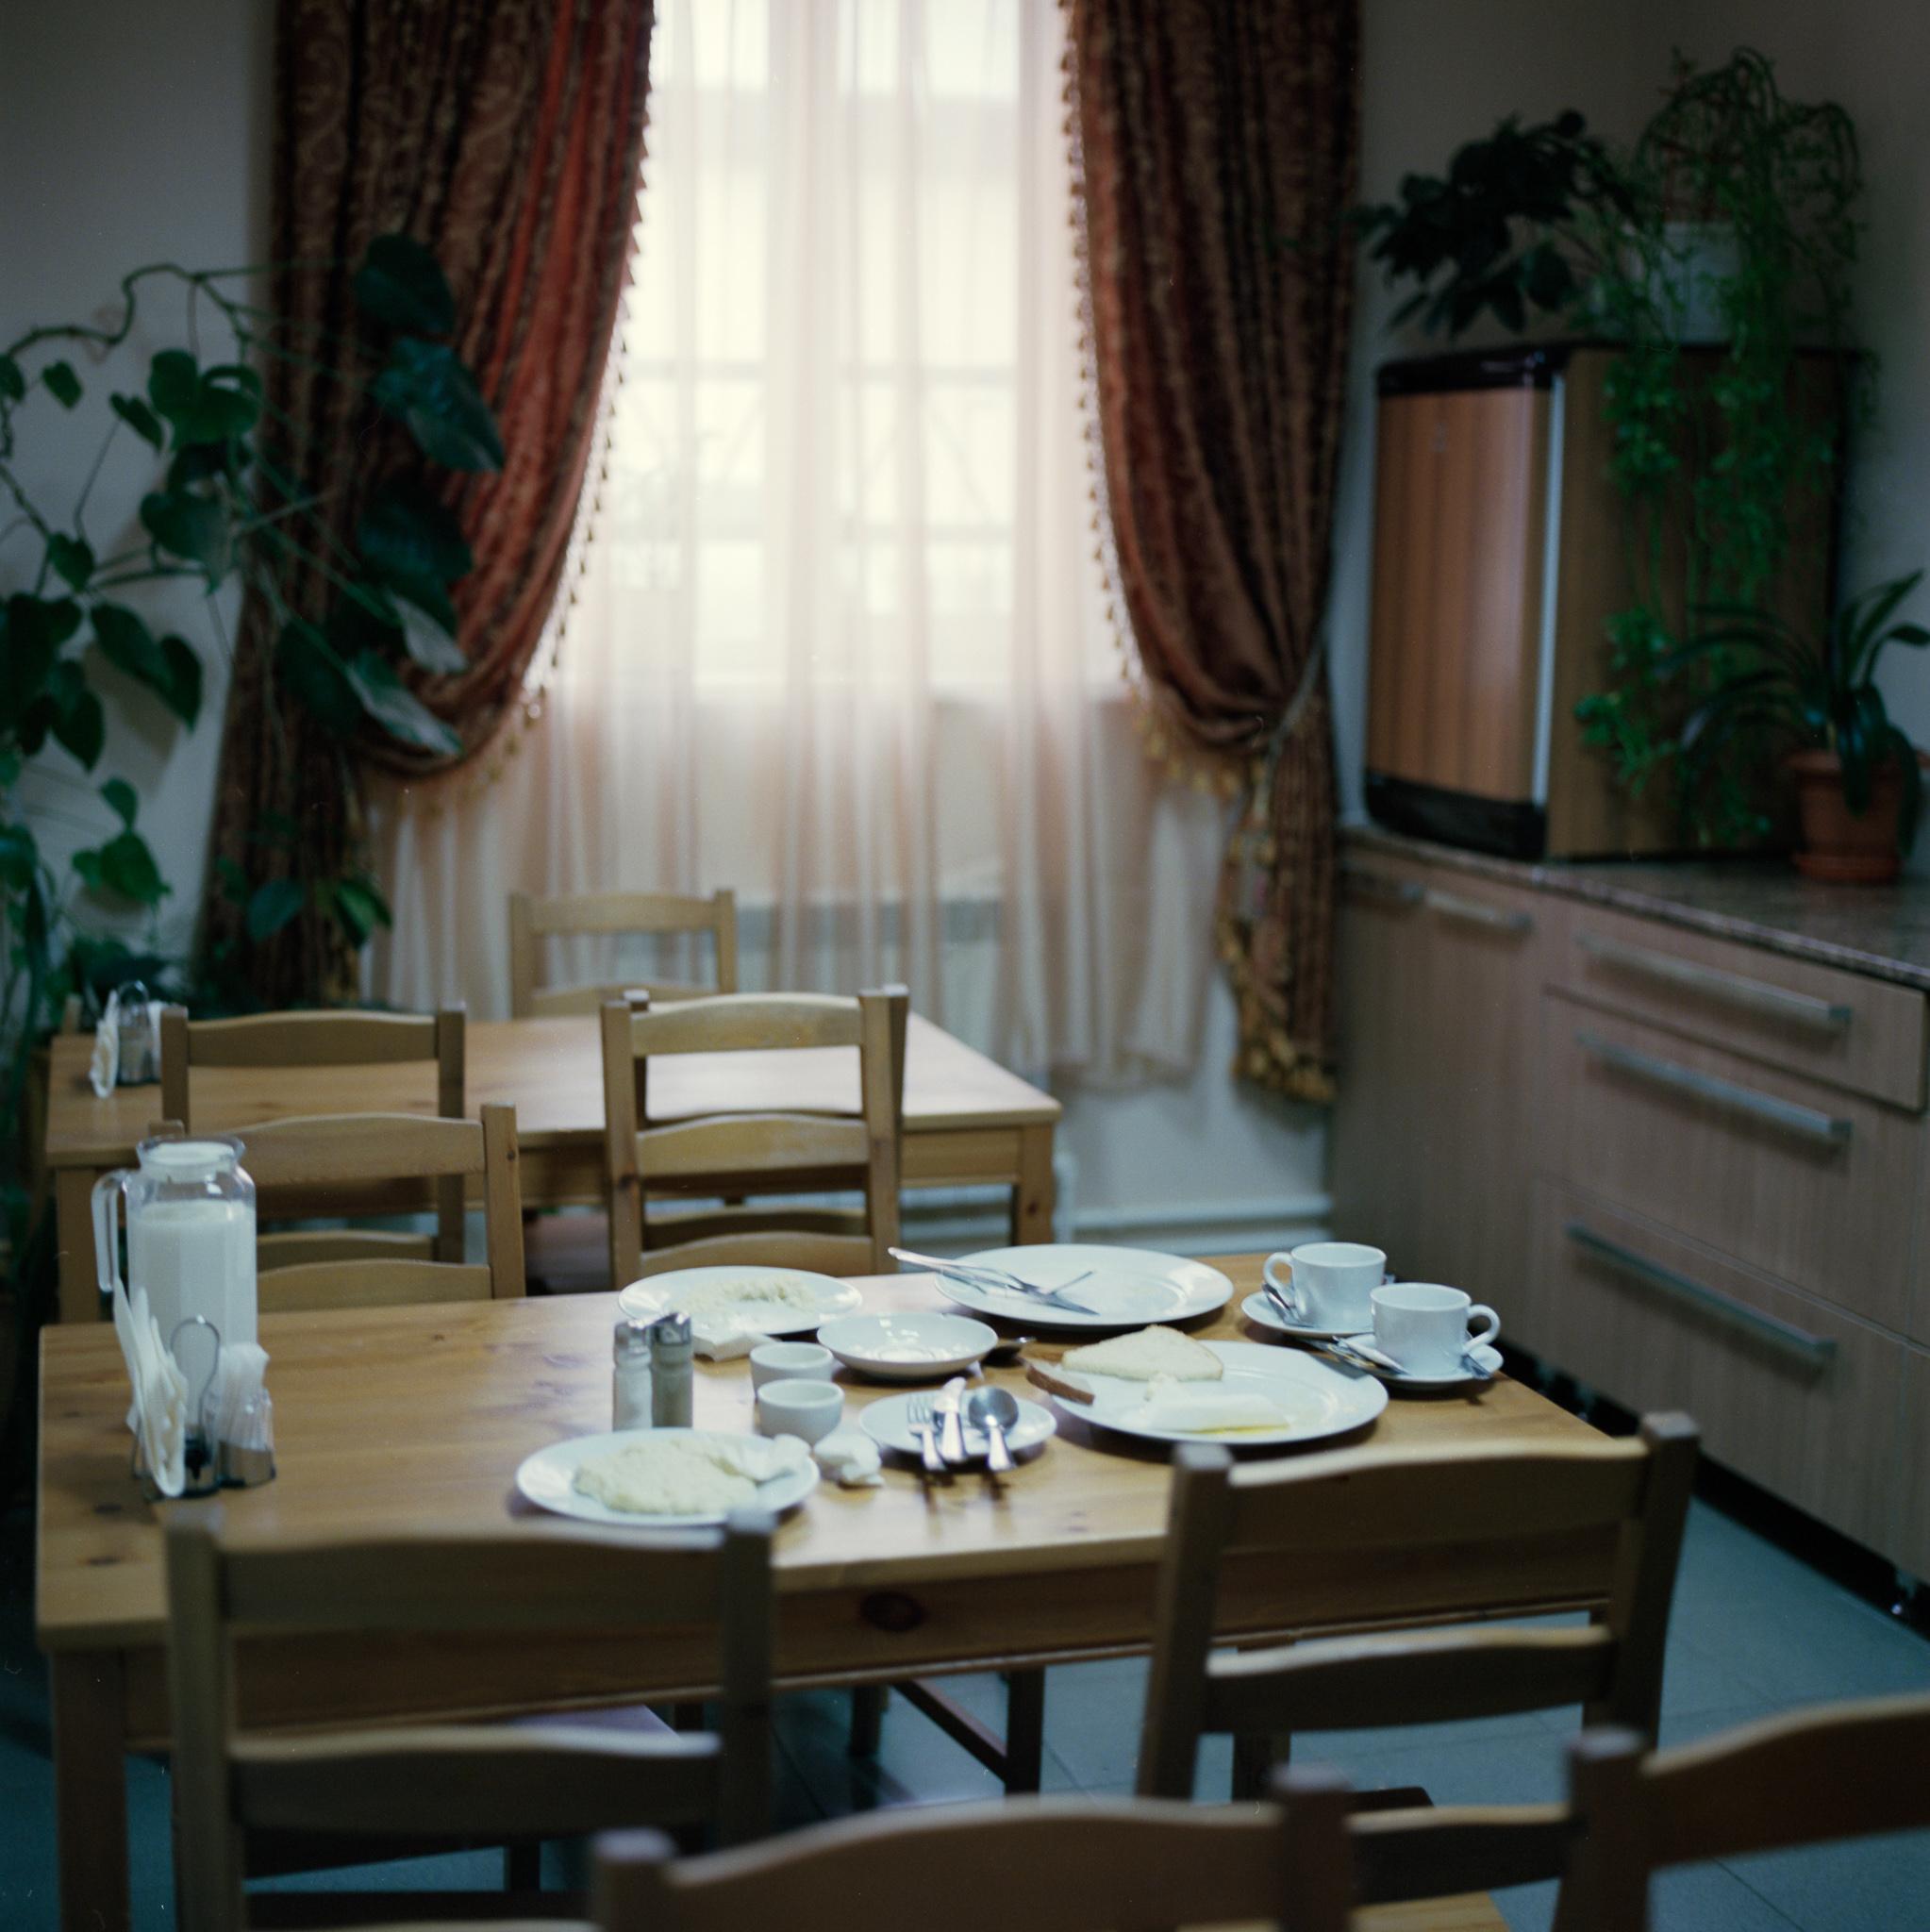 Breakfast in Siberia 1-Edit.jpg